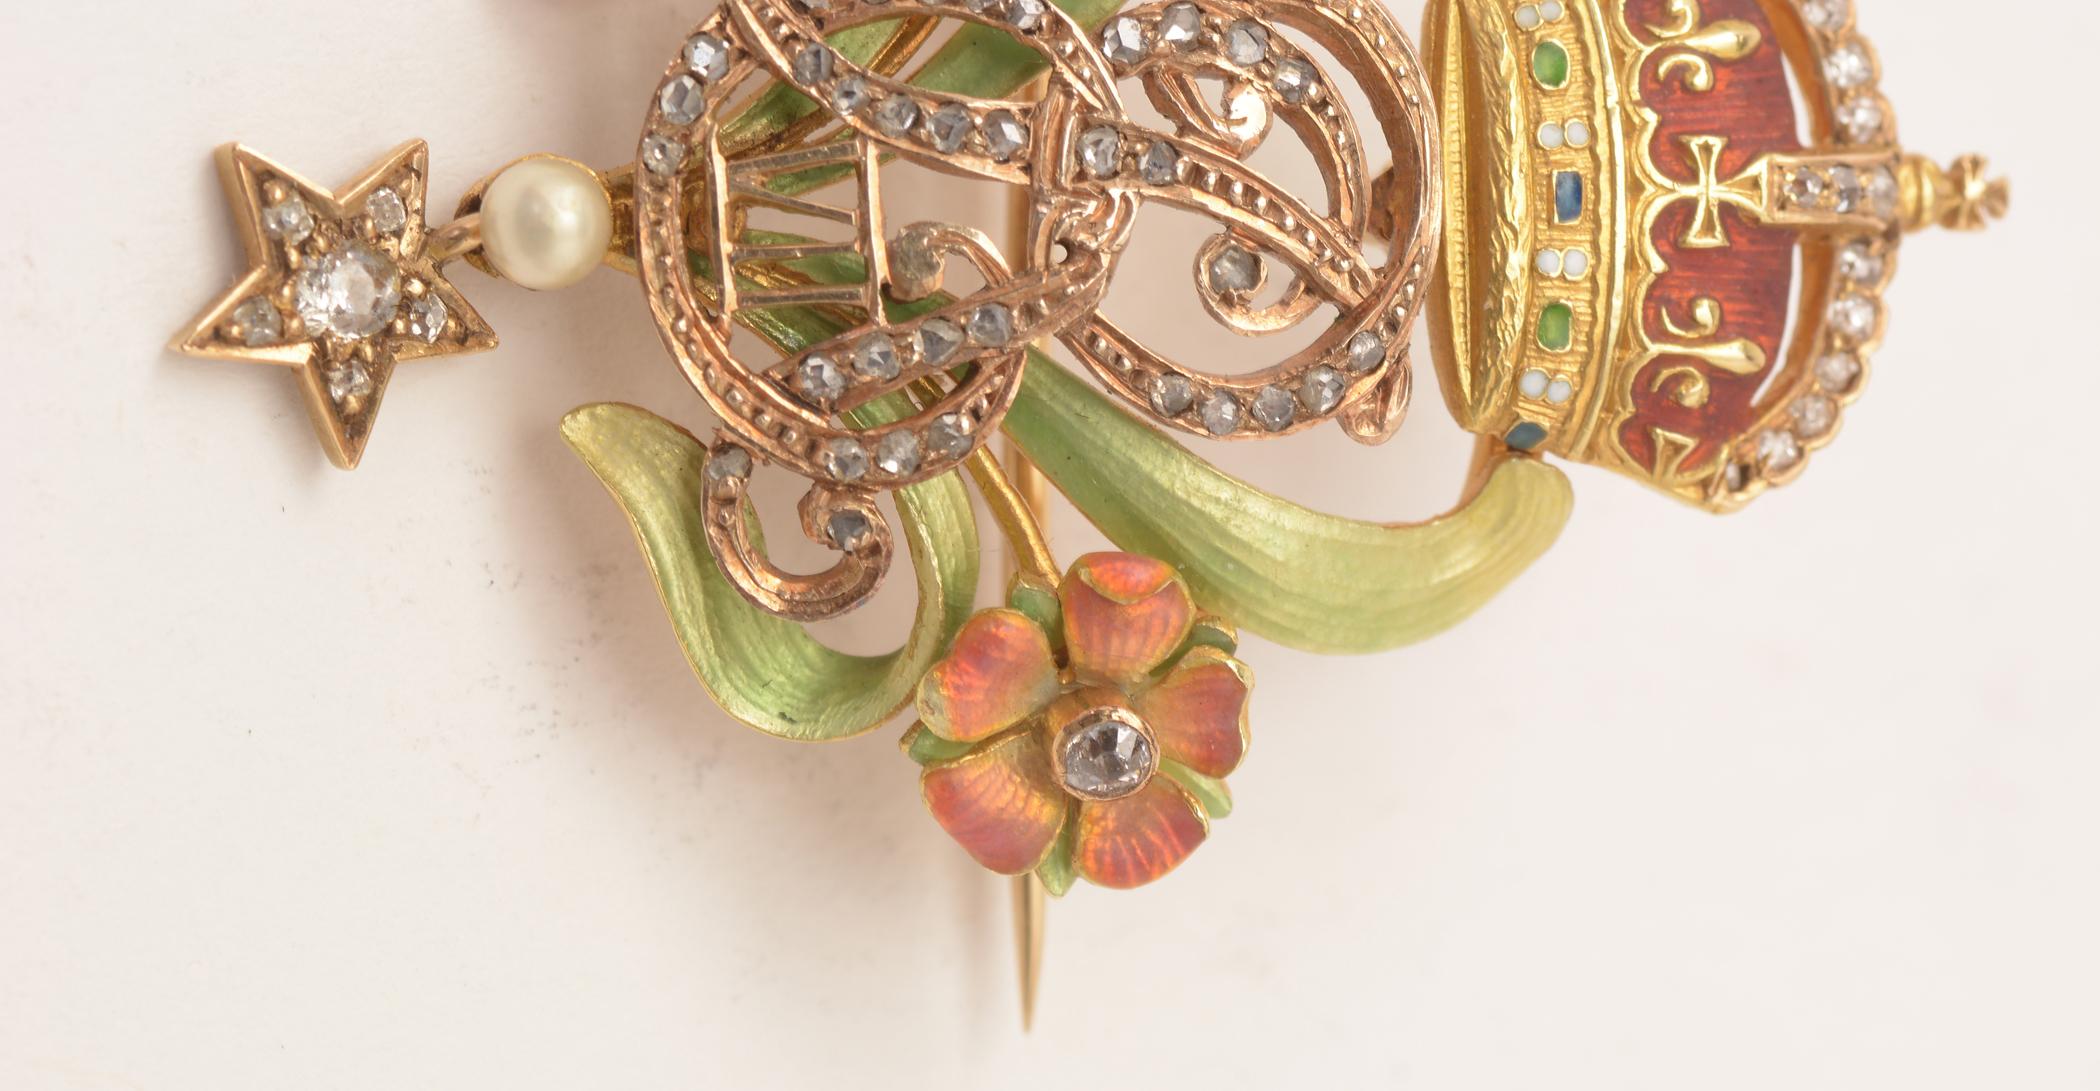 Lot 507 - Edward VII enamel and diamond 18ct brooch, in box